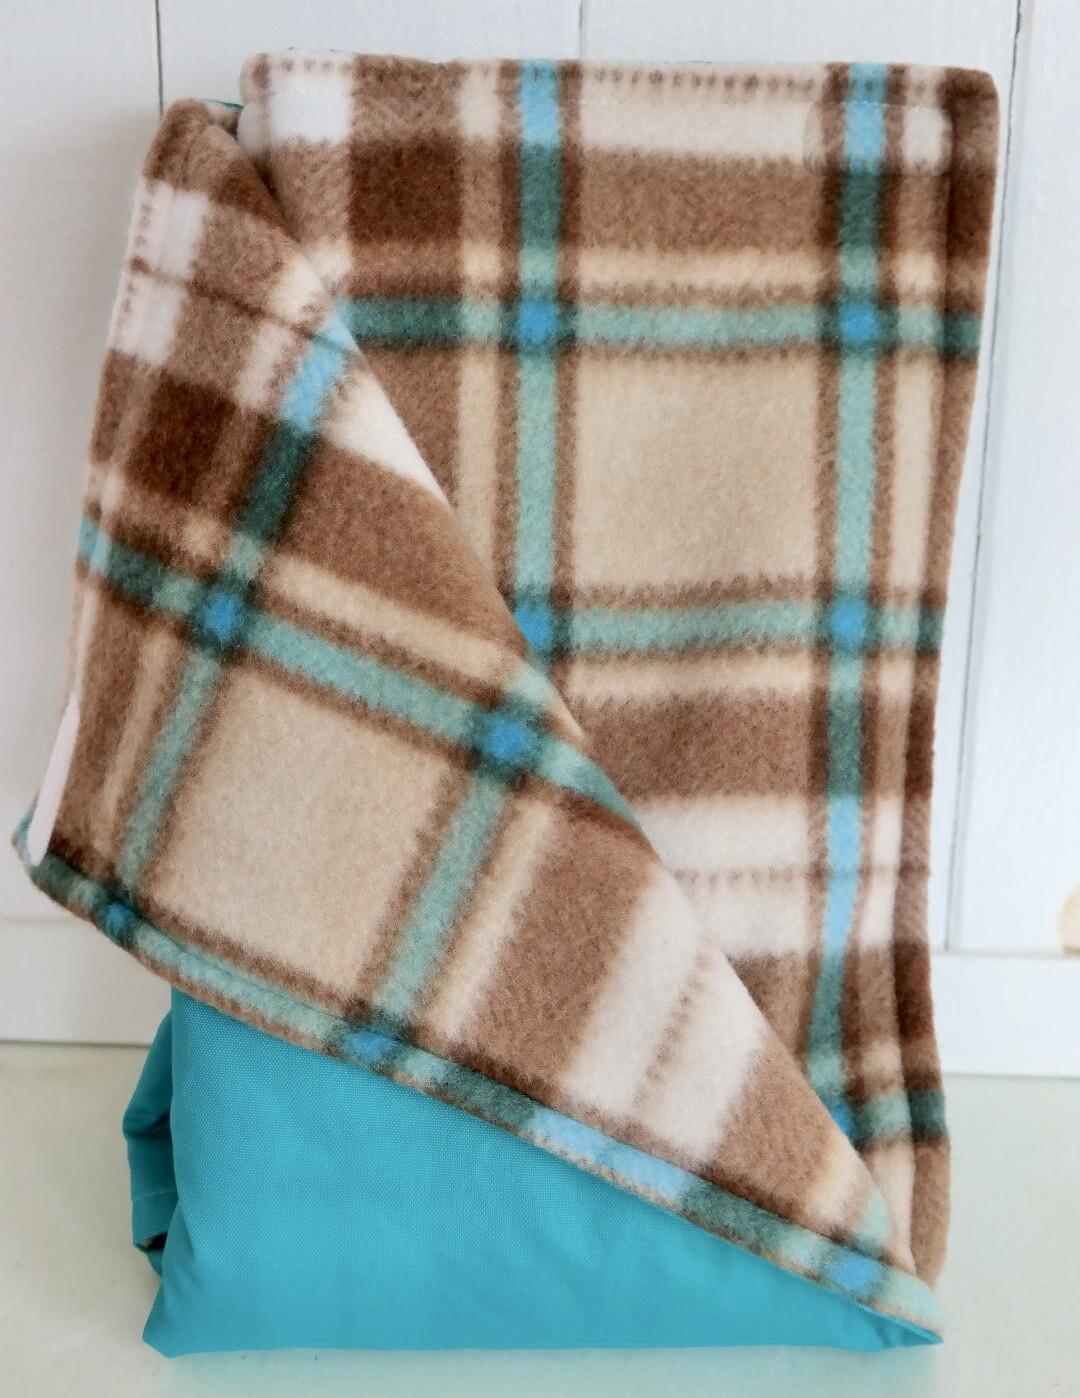 Maine River Otter Blanket 13C-Aqua/Brown&Teal Plaid